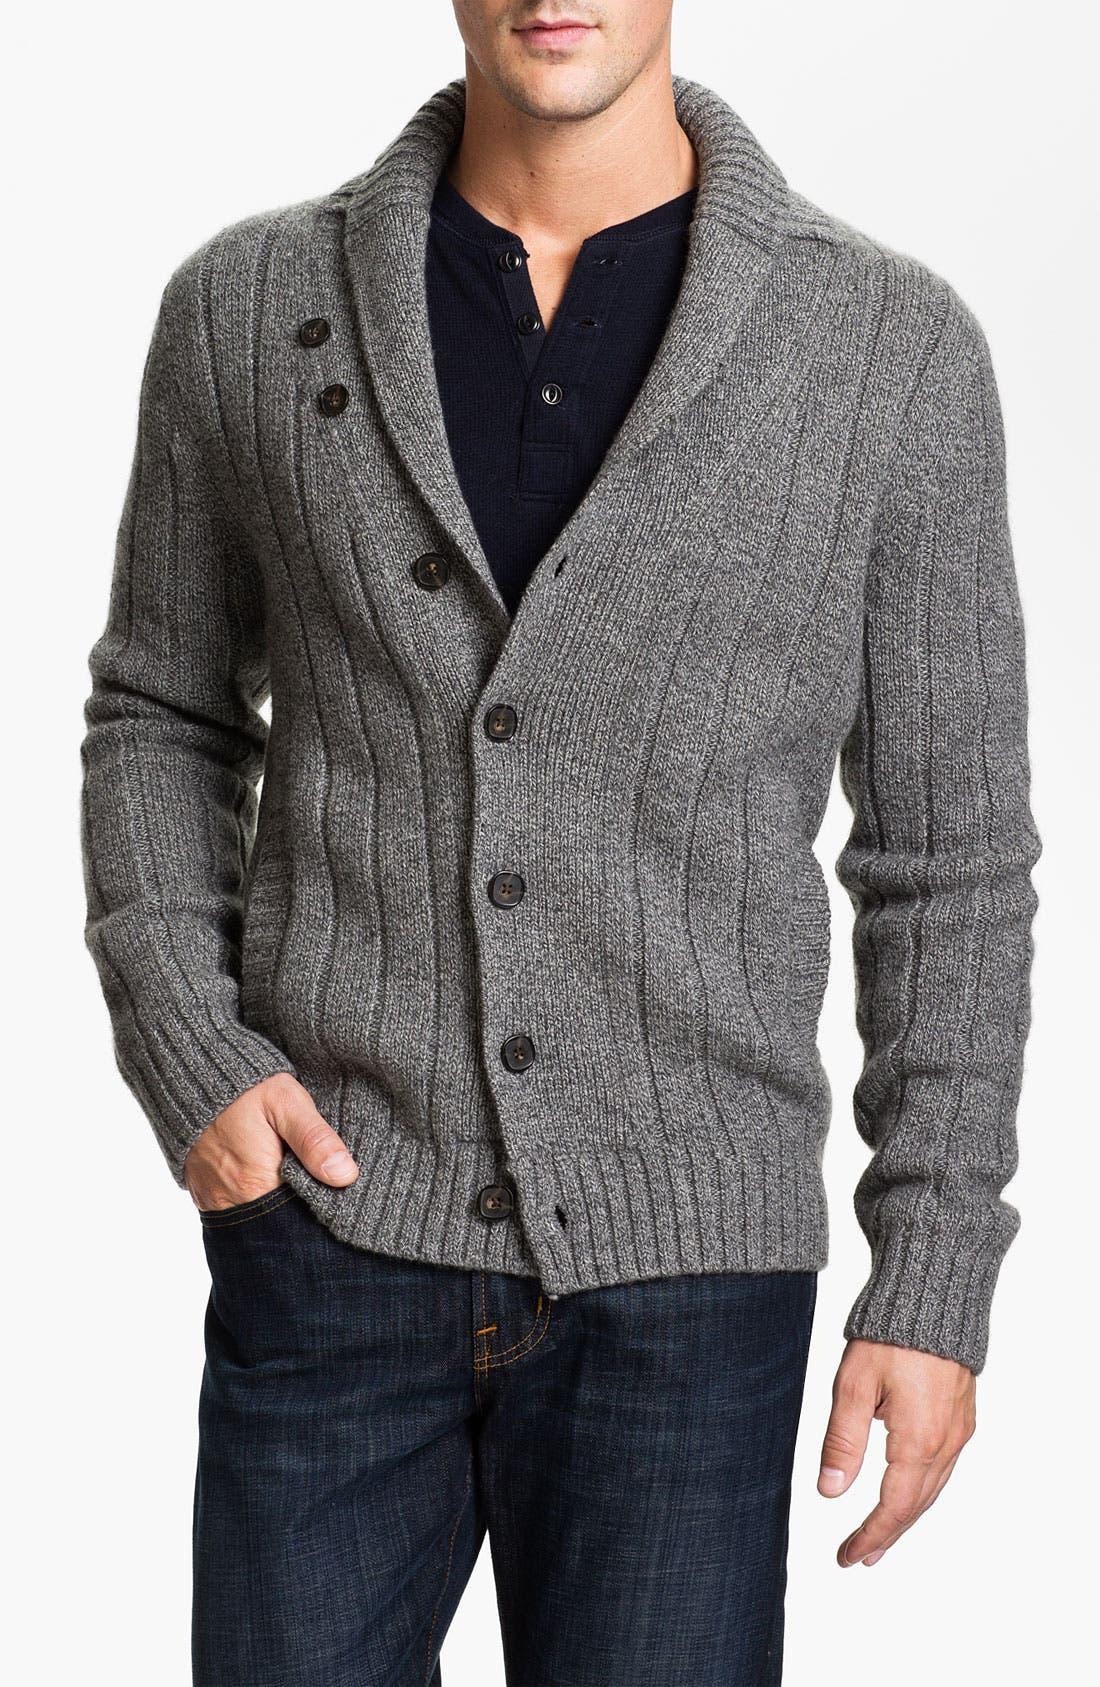 Alternate Image 1 Selected - Façonnable Tailored Denim Shawl Collar Merino Wool Cardigan